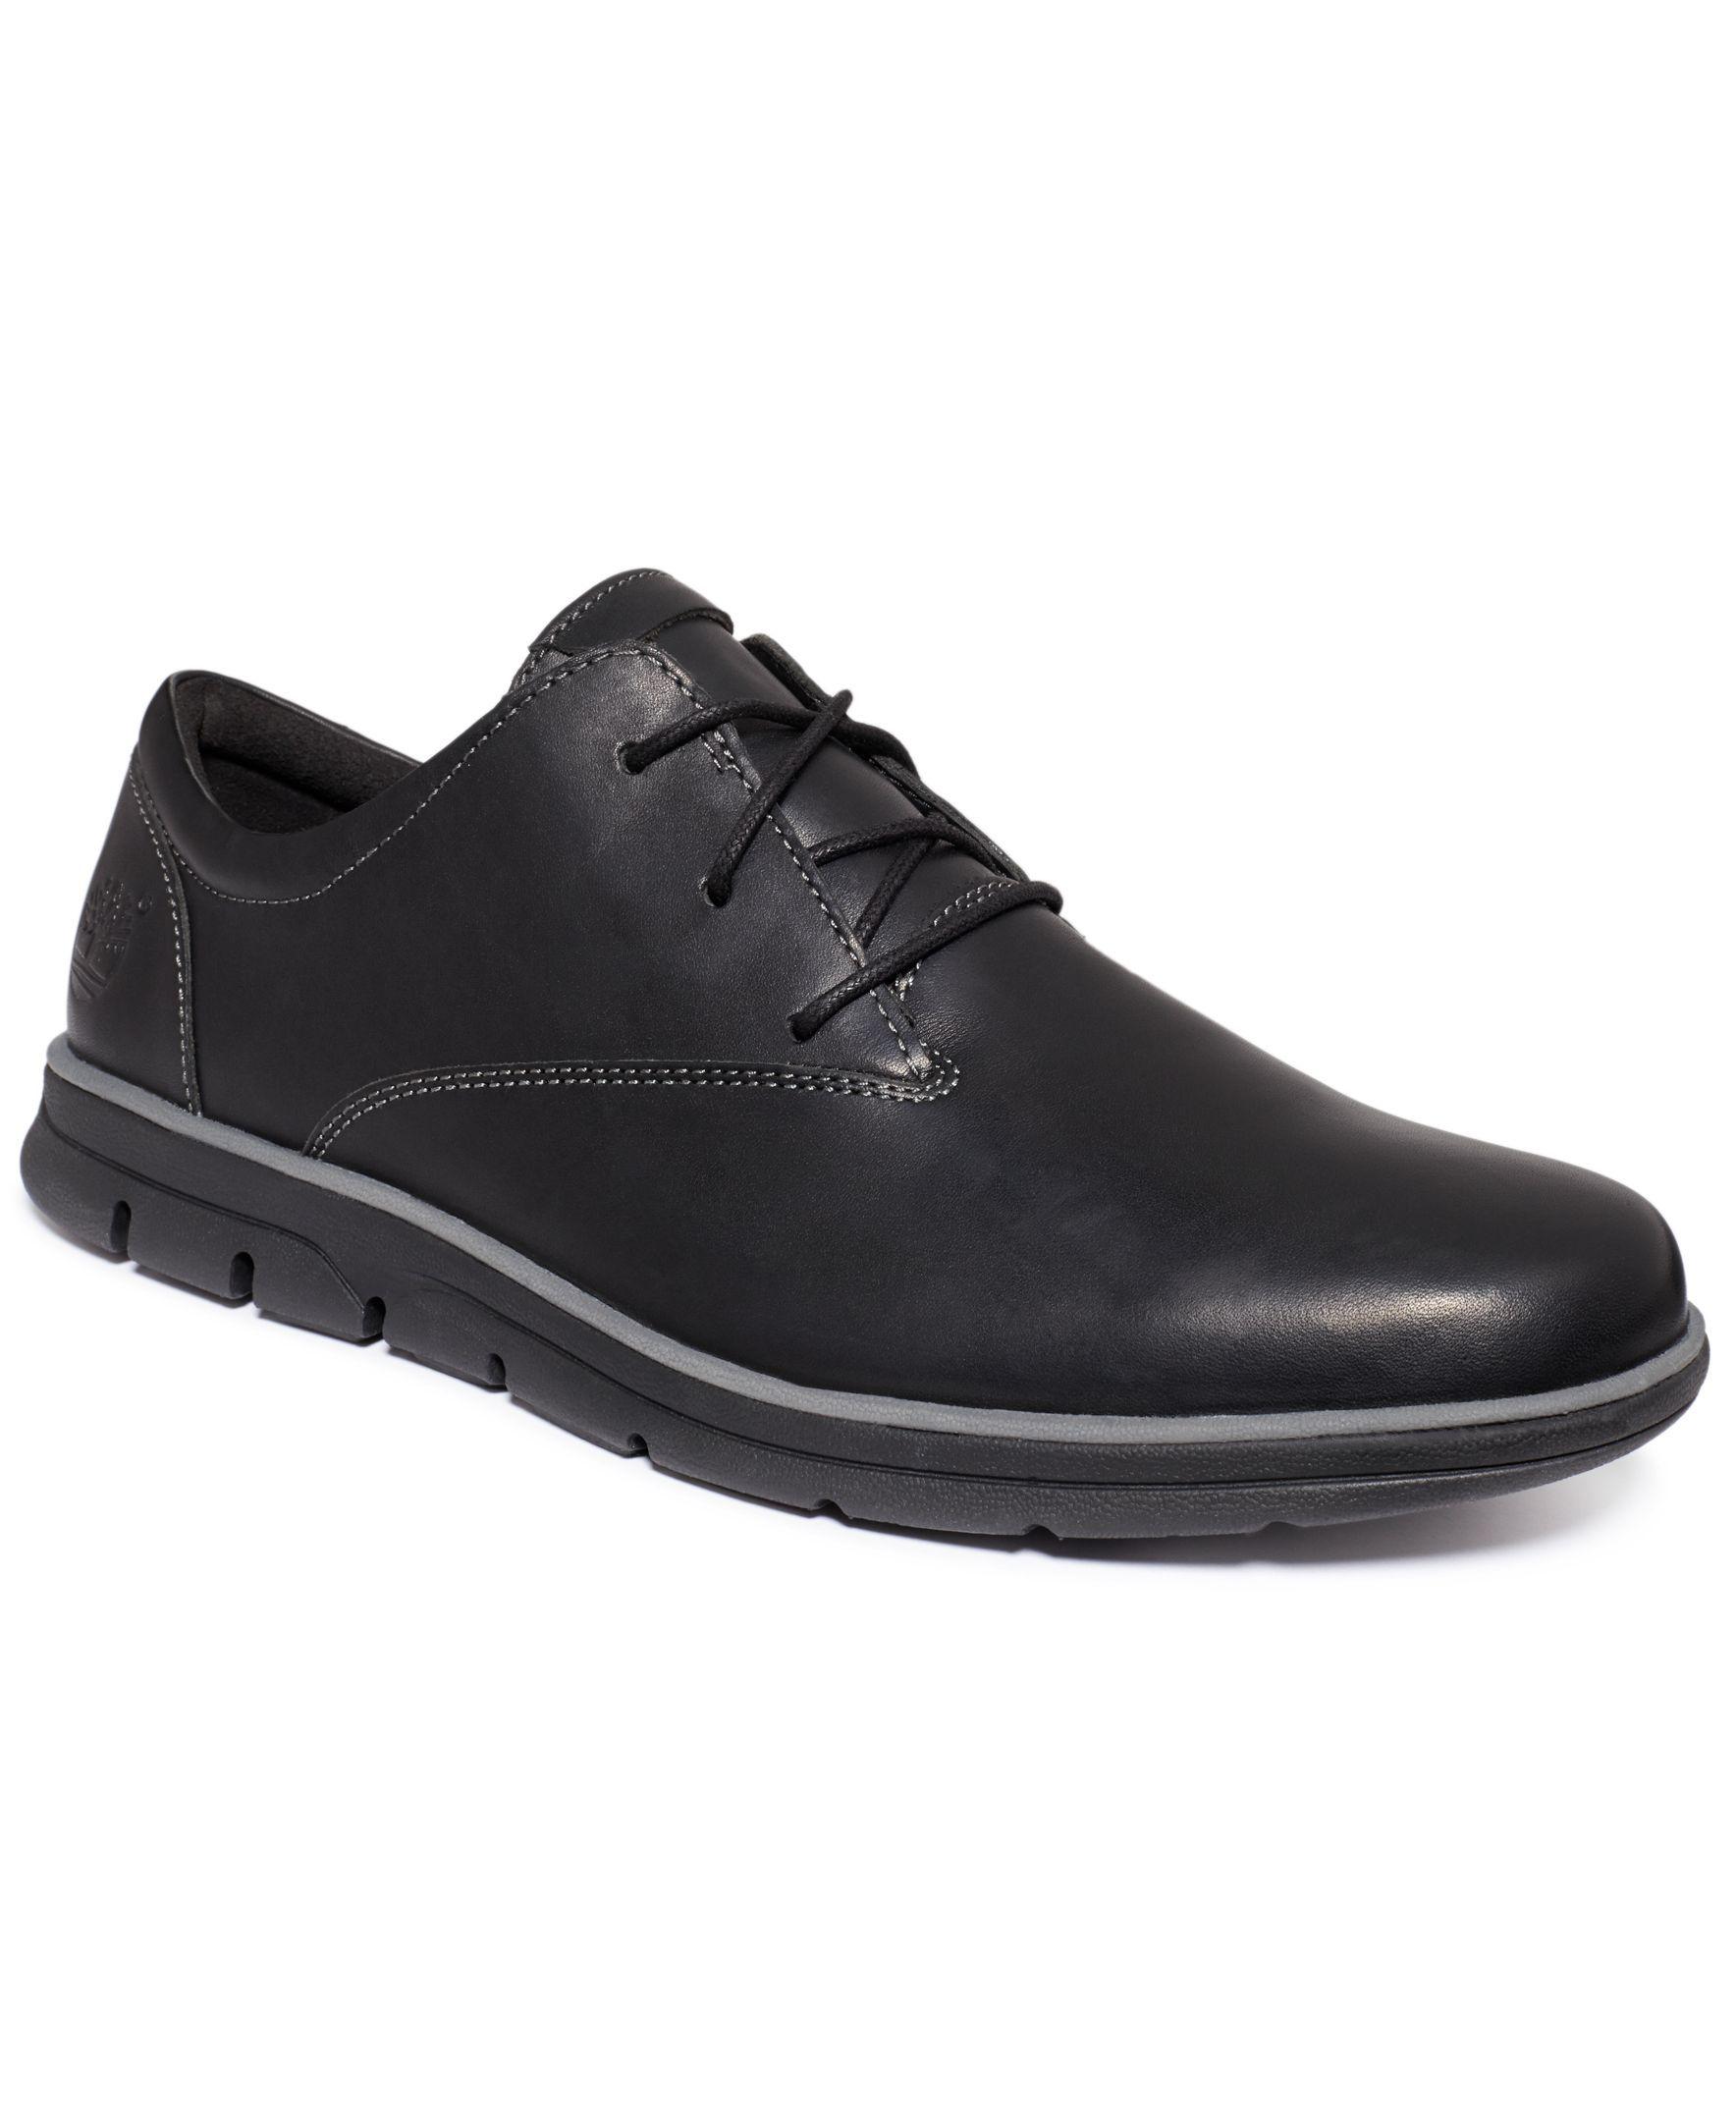 Timberland Men's Bradstreet Plain Toe Oxfords - All Men's Shoes - Men -  Macy's